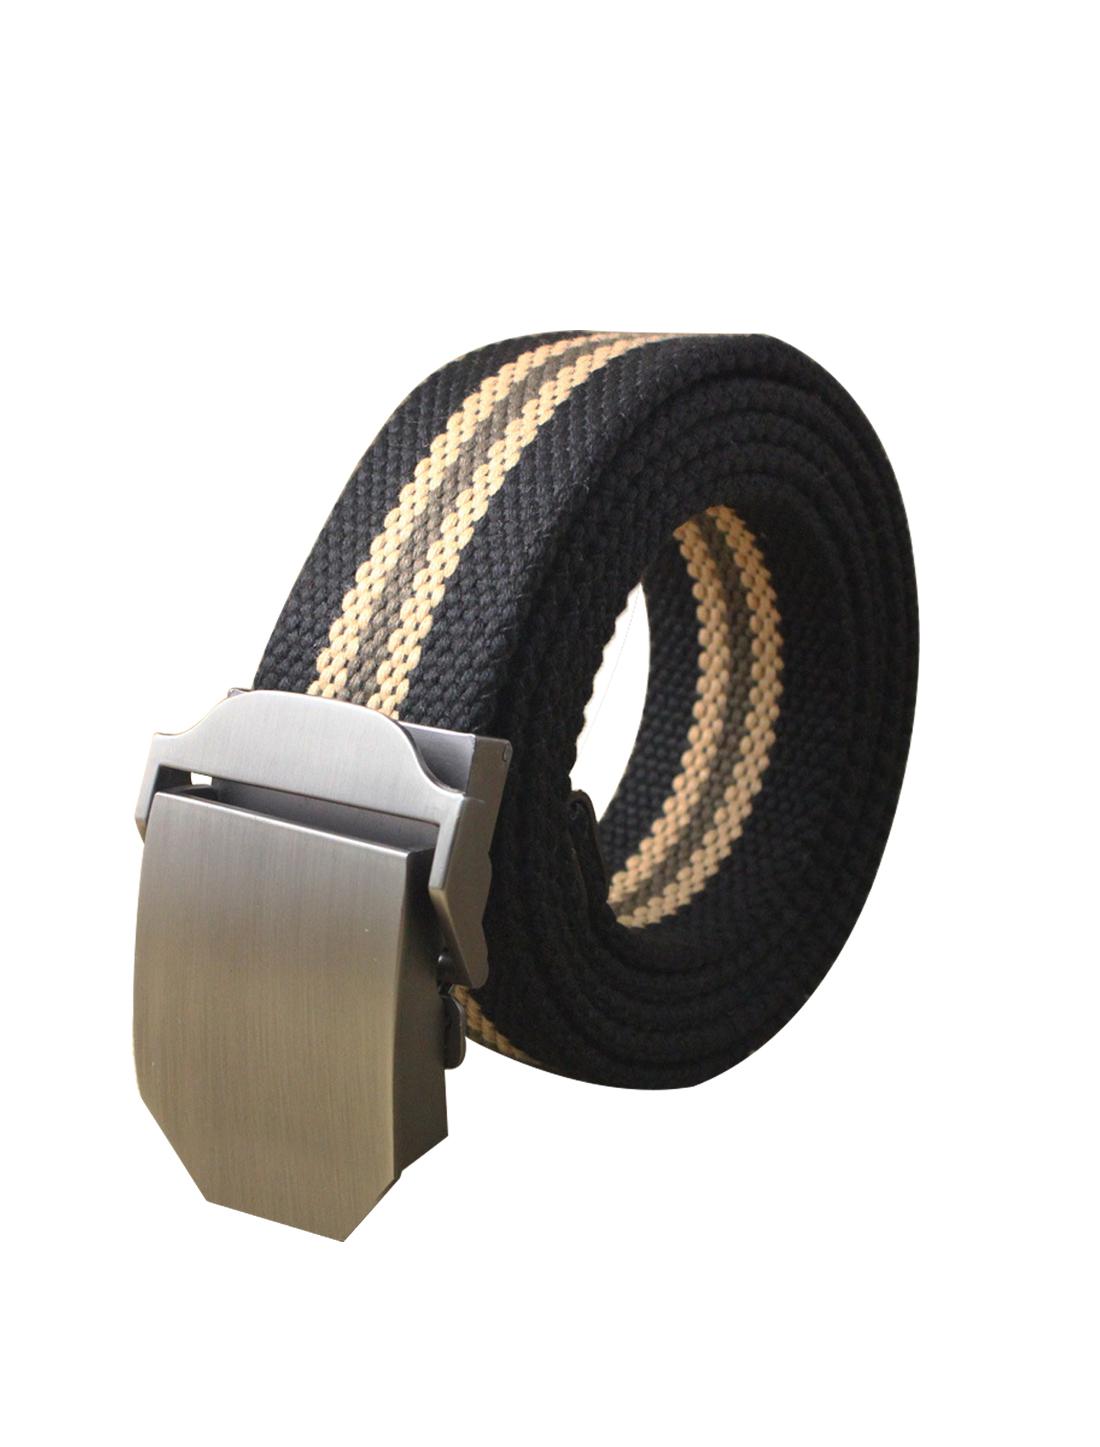 "Men Canvas Automatic Buckle Adjustable Holeless Striped Belt Width 1 1/2"" Black"